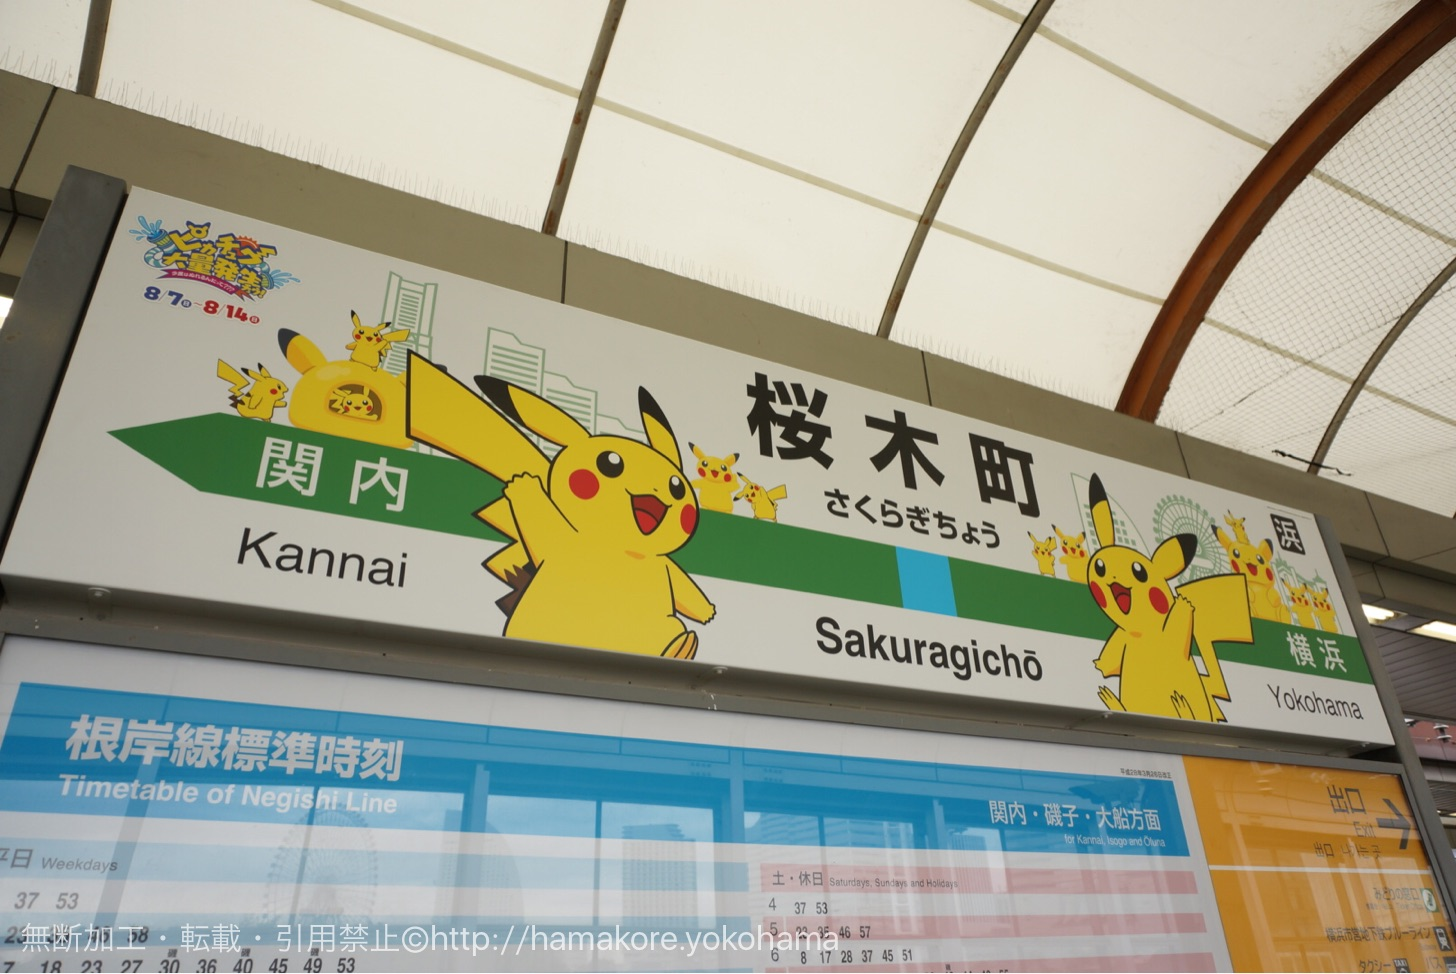 JR桜木町駅のホーム・改札がピカチュウ仕様!ピカチュウ大量発生チュウ!コラボ企画